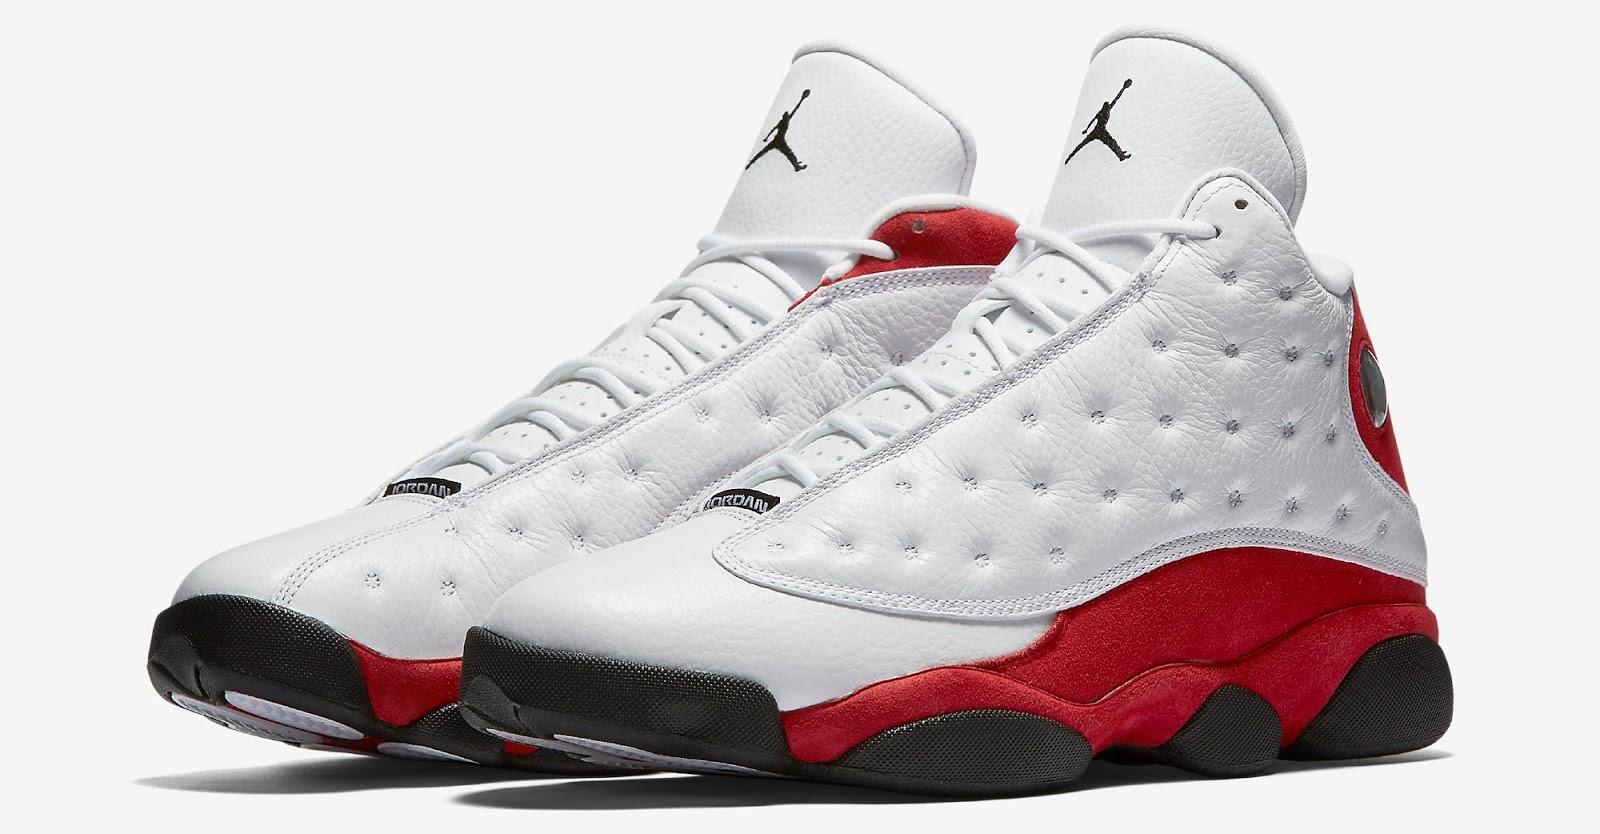 quality design 27890 bcbf3 Air Jordan 13 Retro